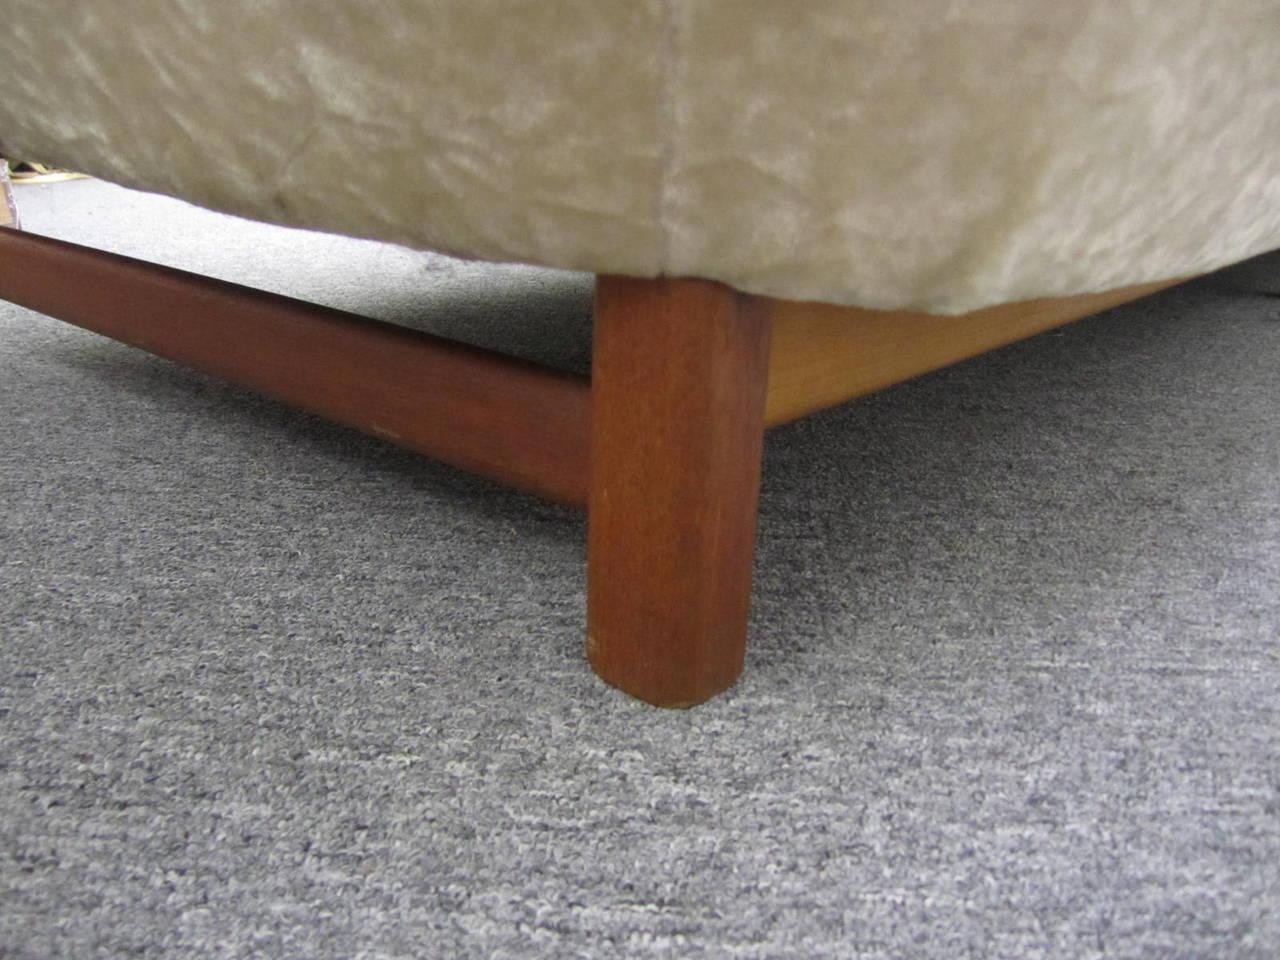 Dazzling R. Huber Curved Back Teak Sofa, Mid-Century Danish Modern In Good Condition For Sale In Medford, NJ